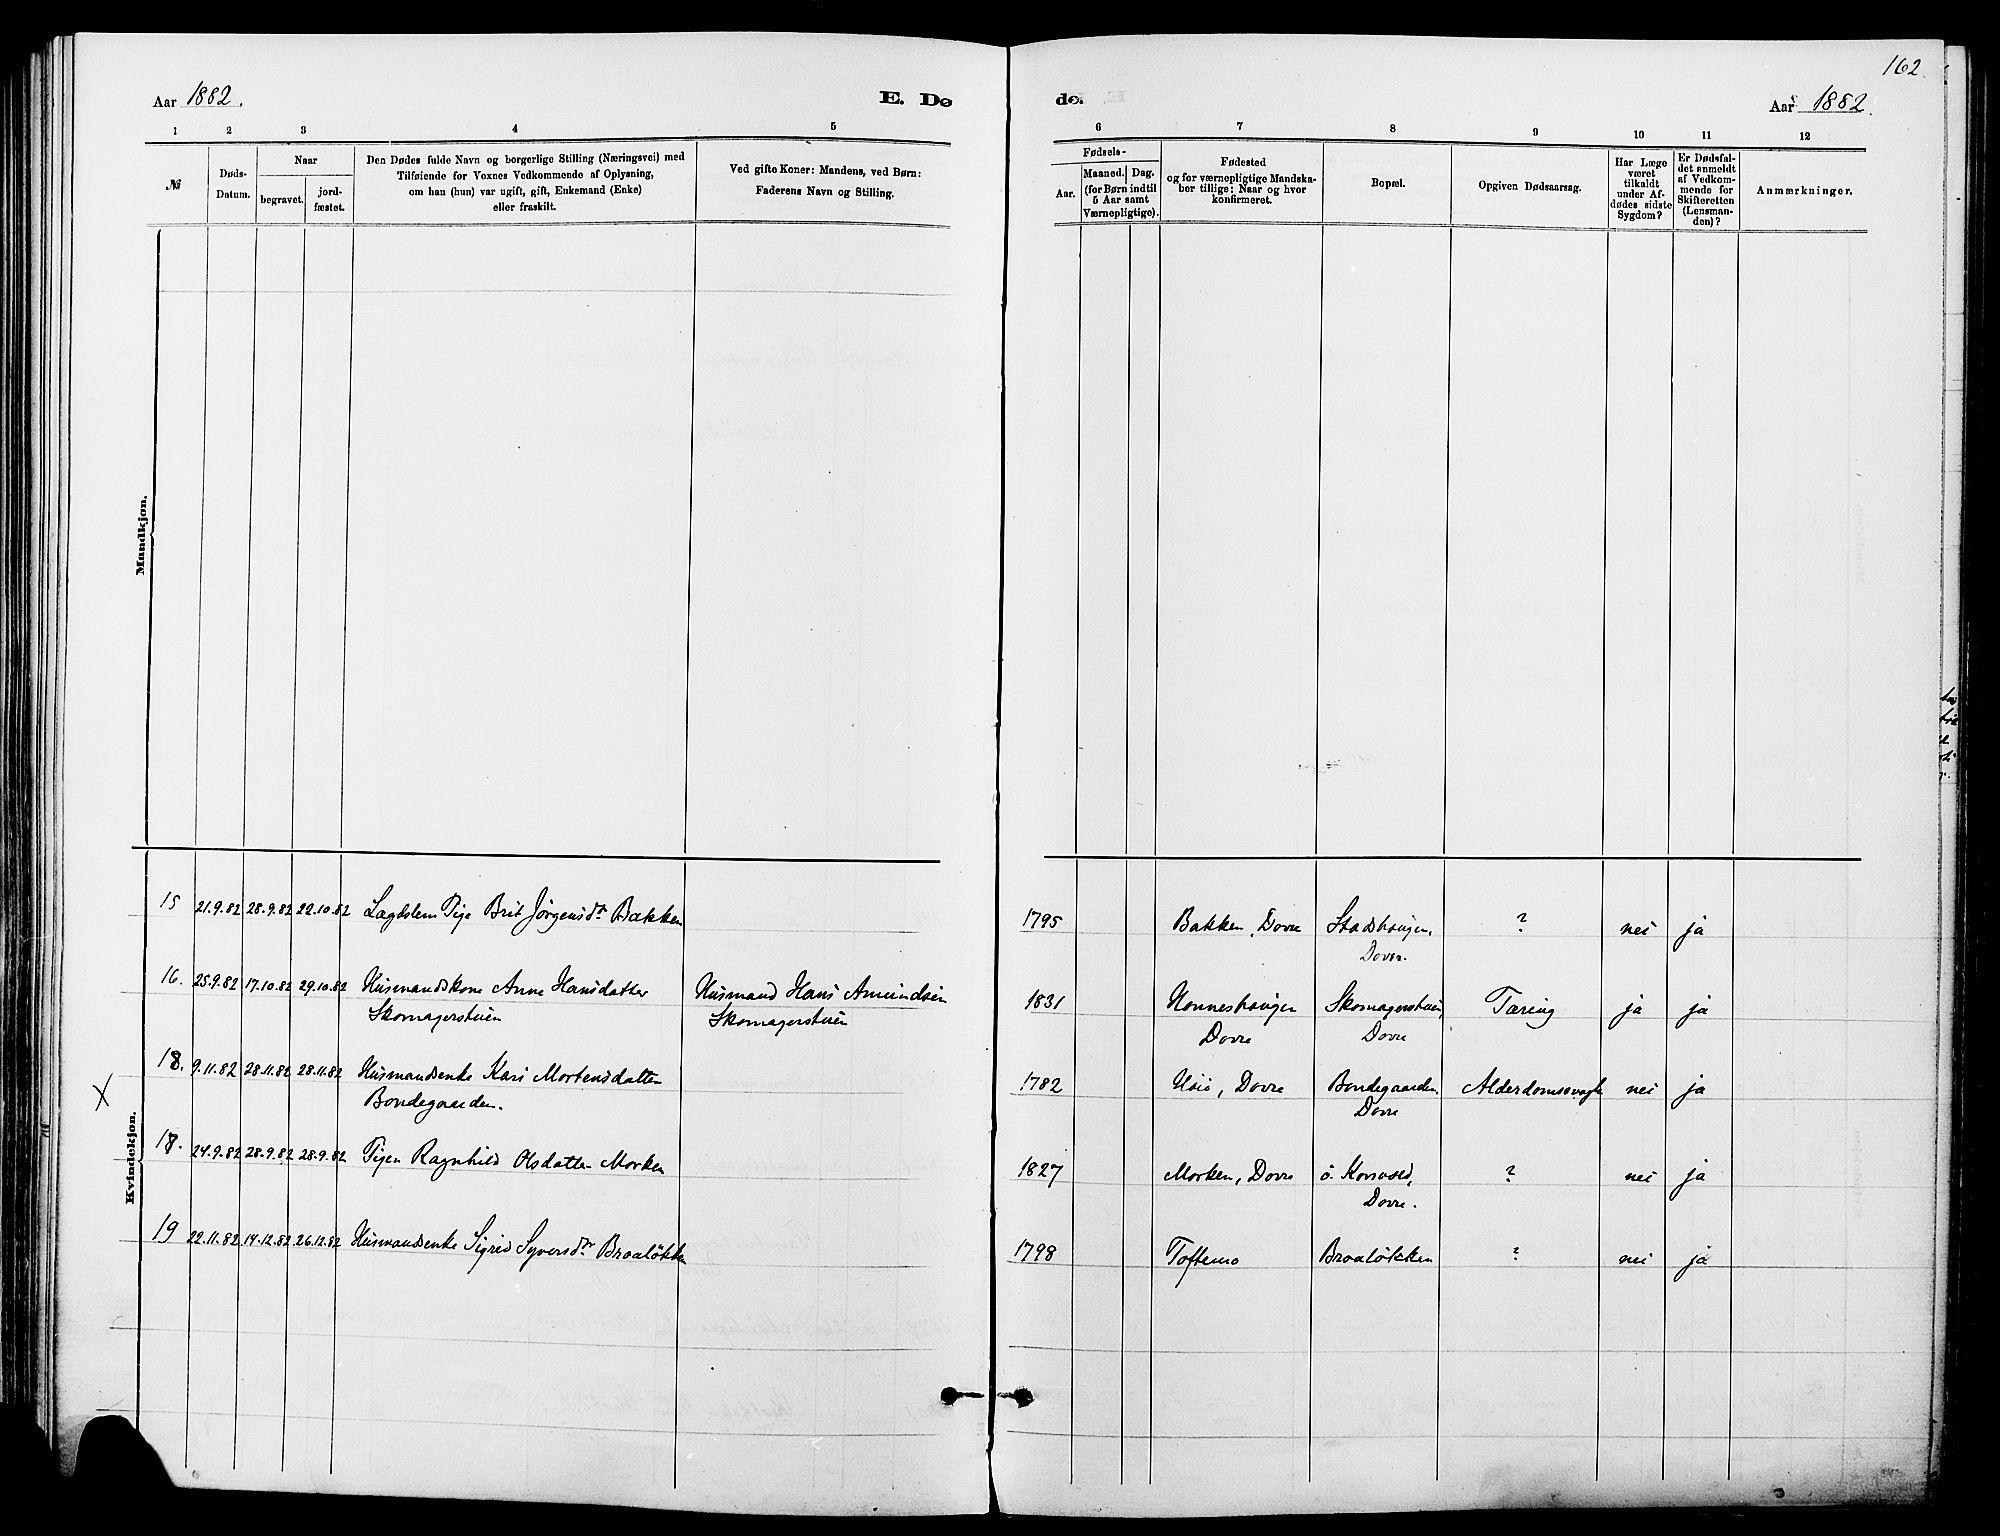 SAH, Dovre prestekontor, Ministerialbok nr. 2, 1879-1890, s. 162